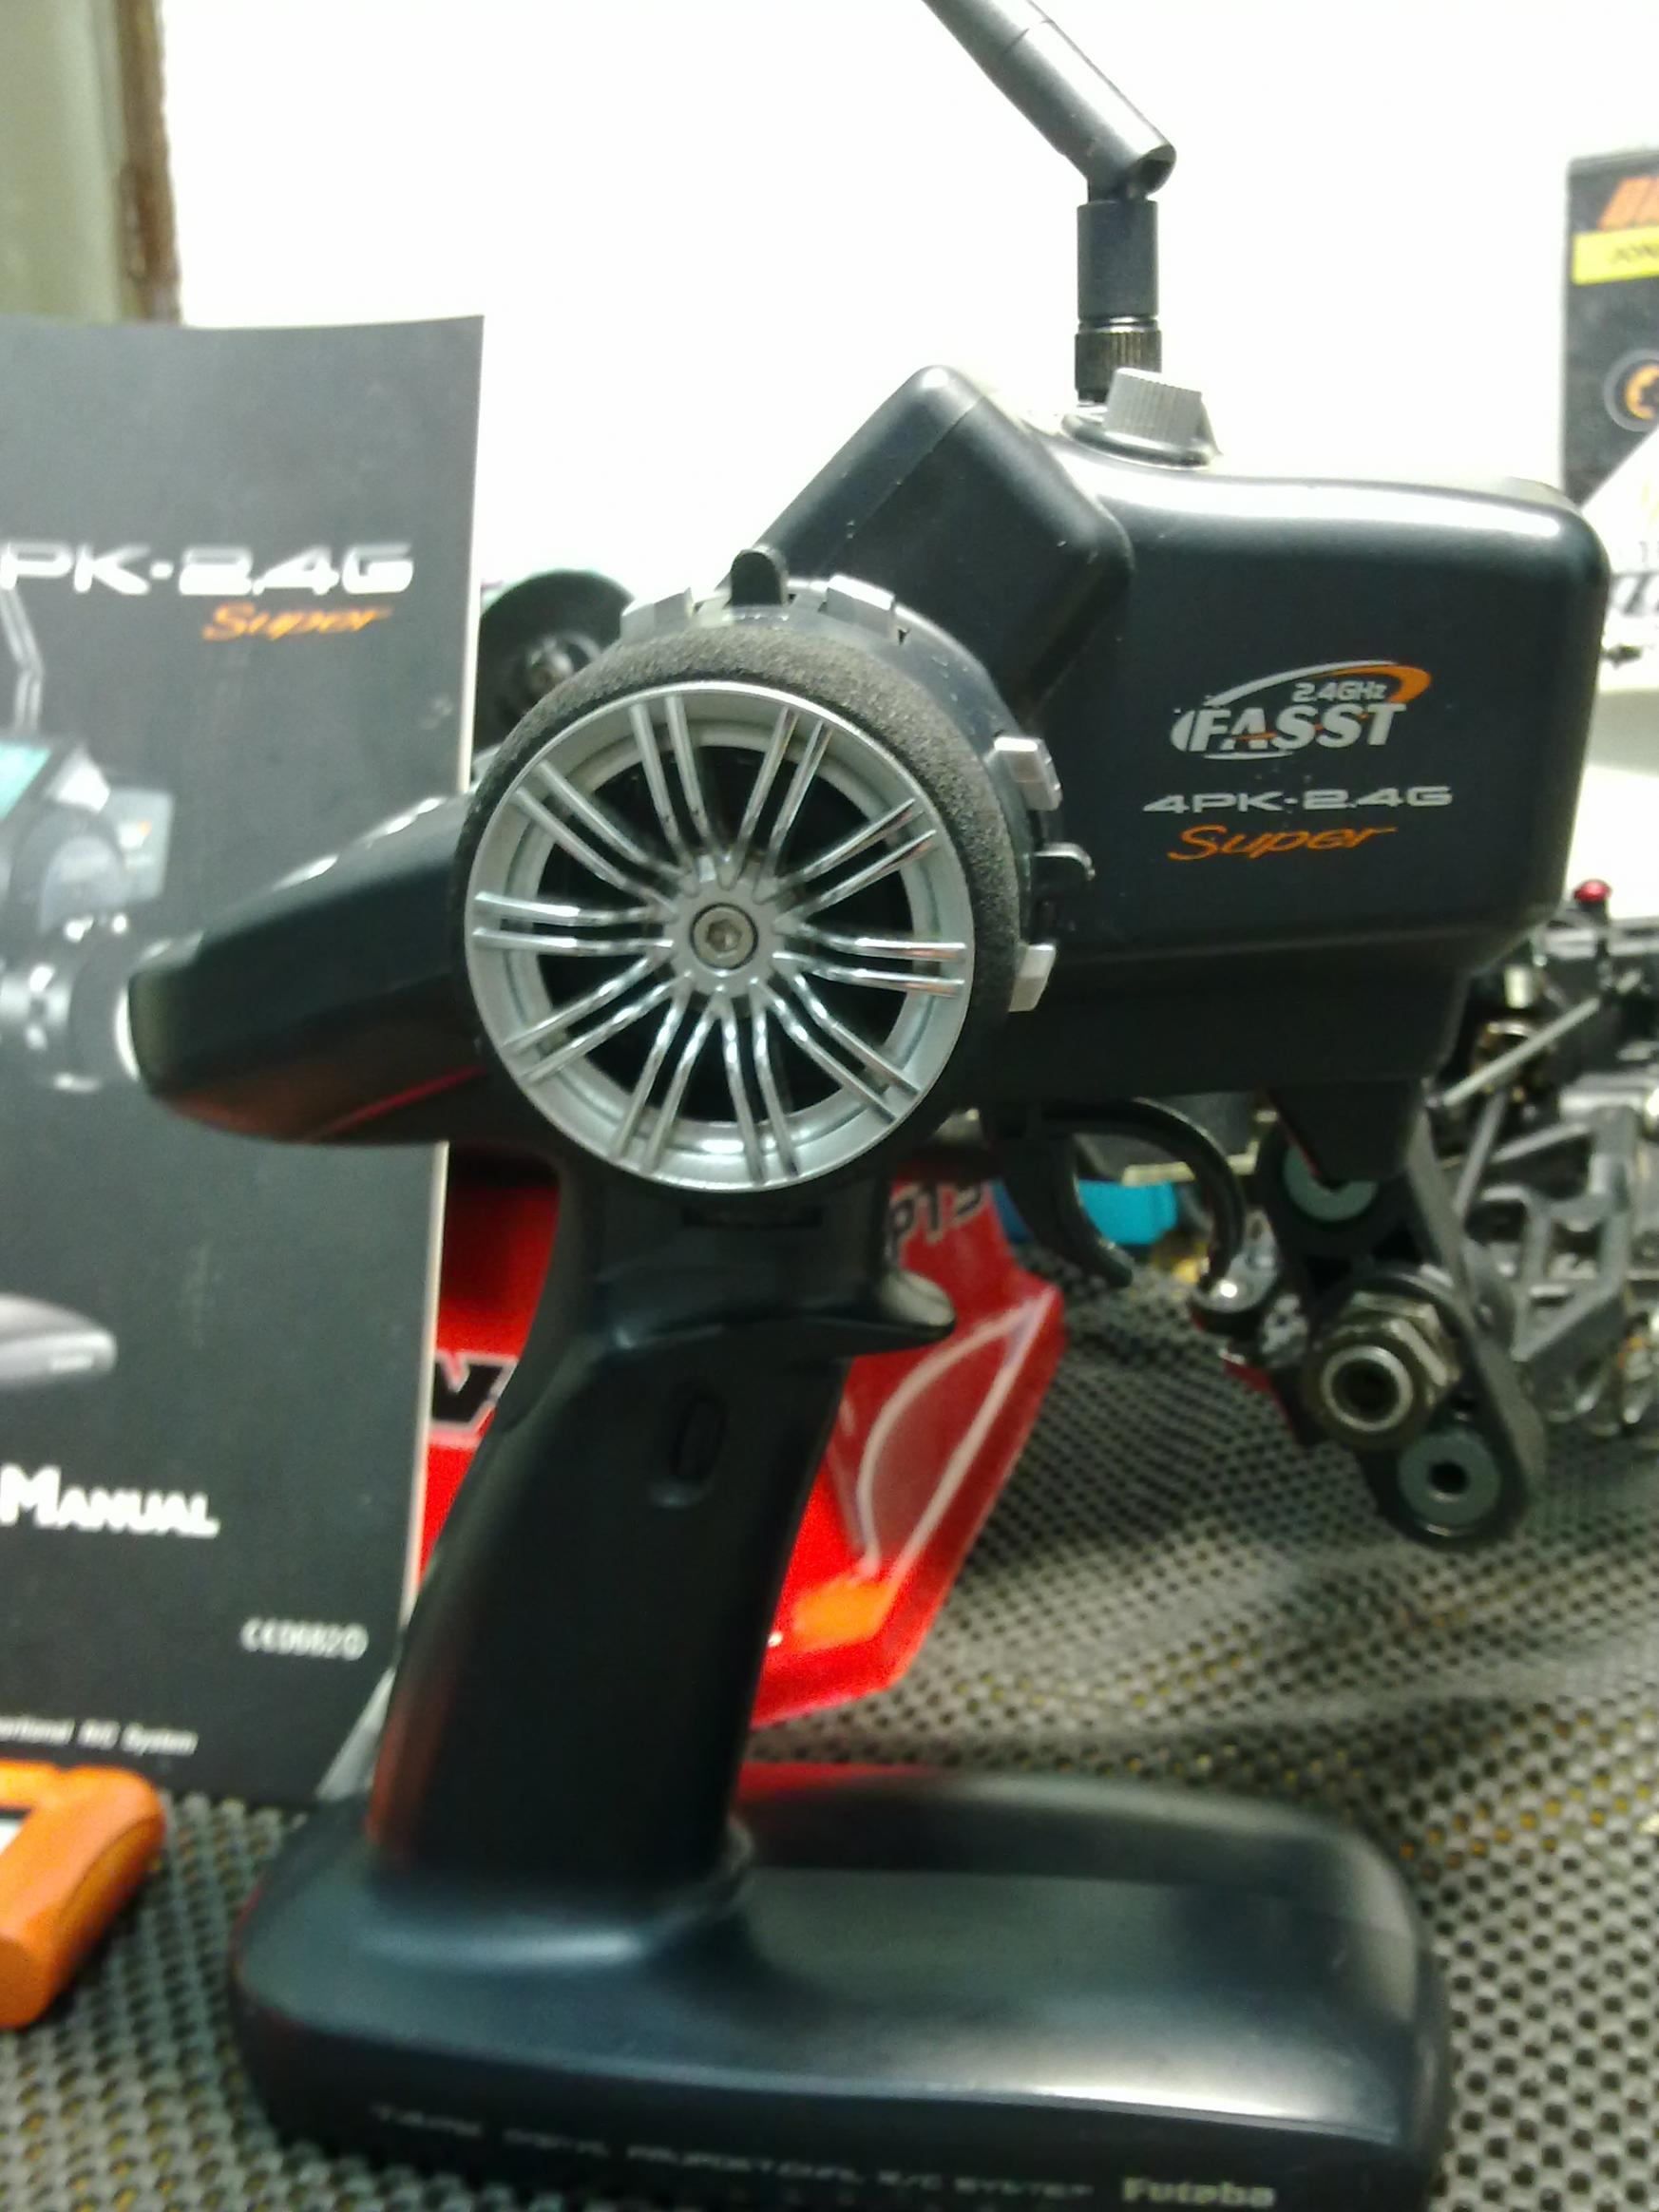 malaysian-r-c-racers/339634-wts-futaba-3pk-spektrum-used-tyre-etc.html